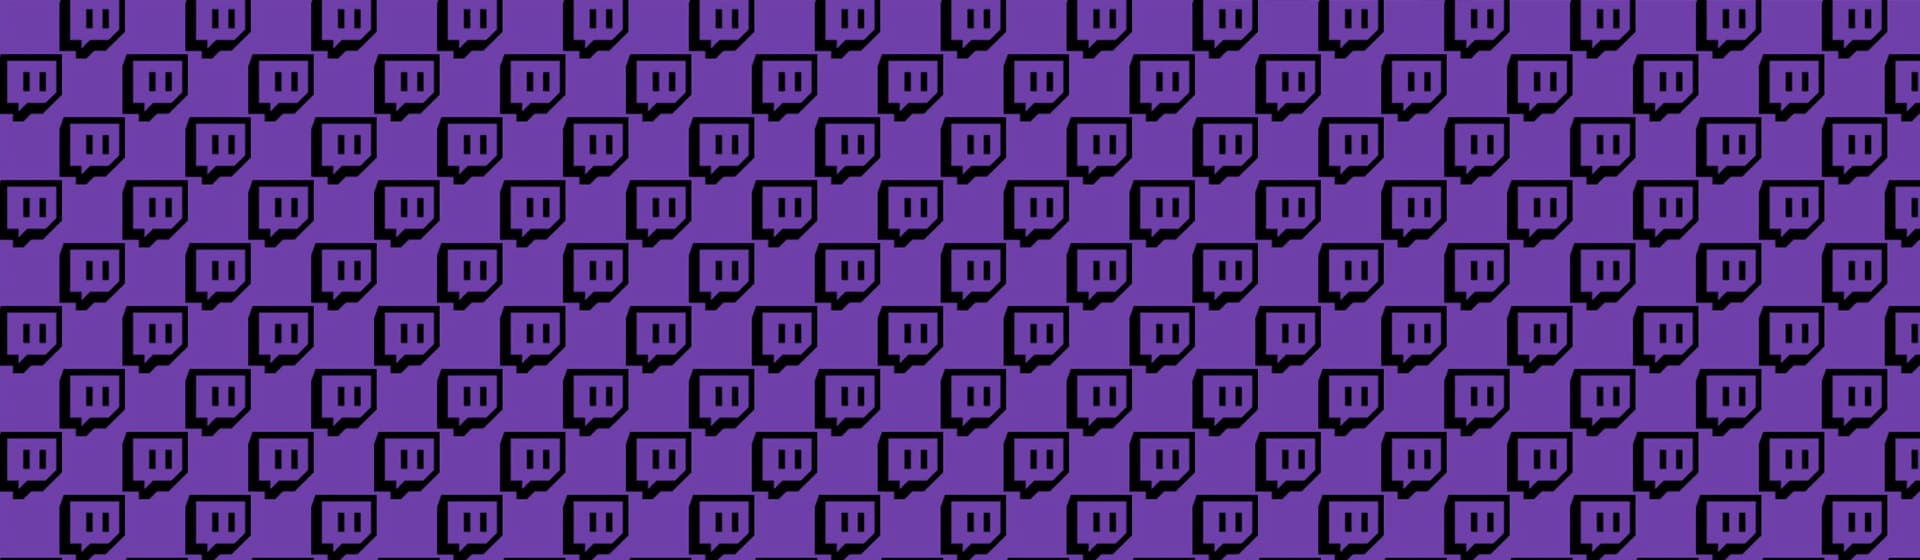 Twitch - Мерч и одежда с атрибутикой